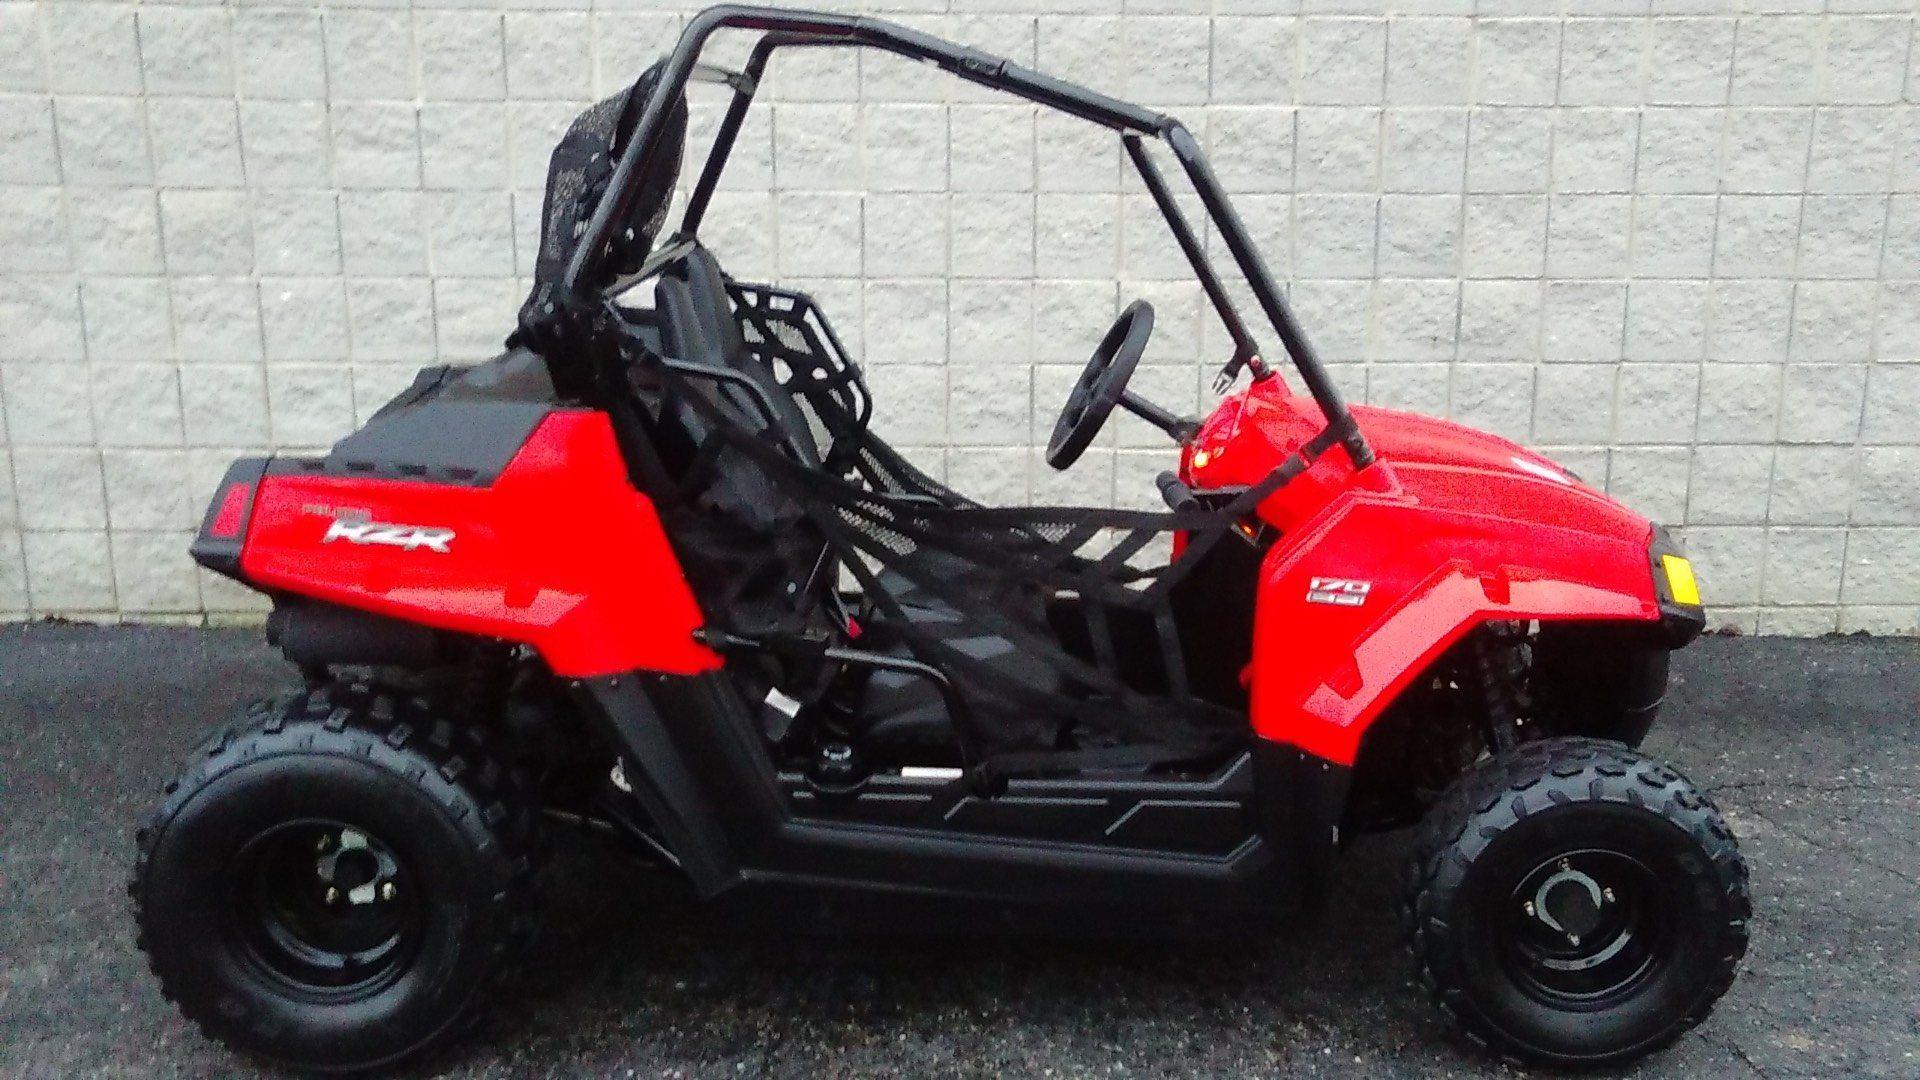 2015 Polaris RZR 170 EFI for sale 22785